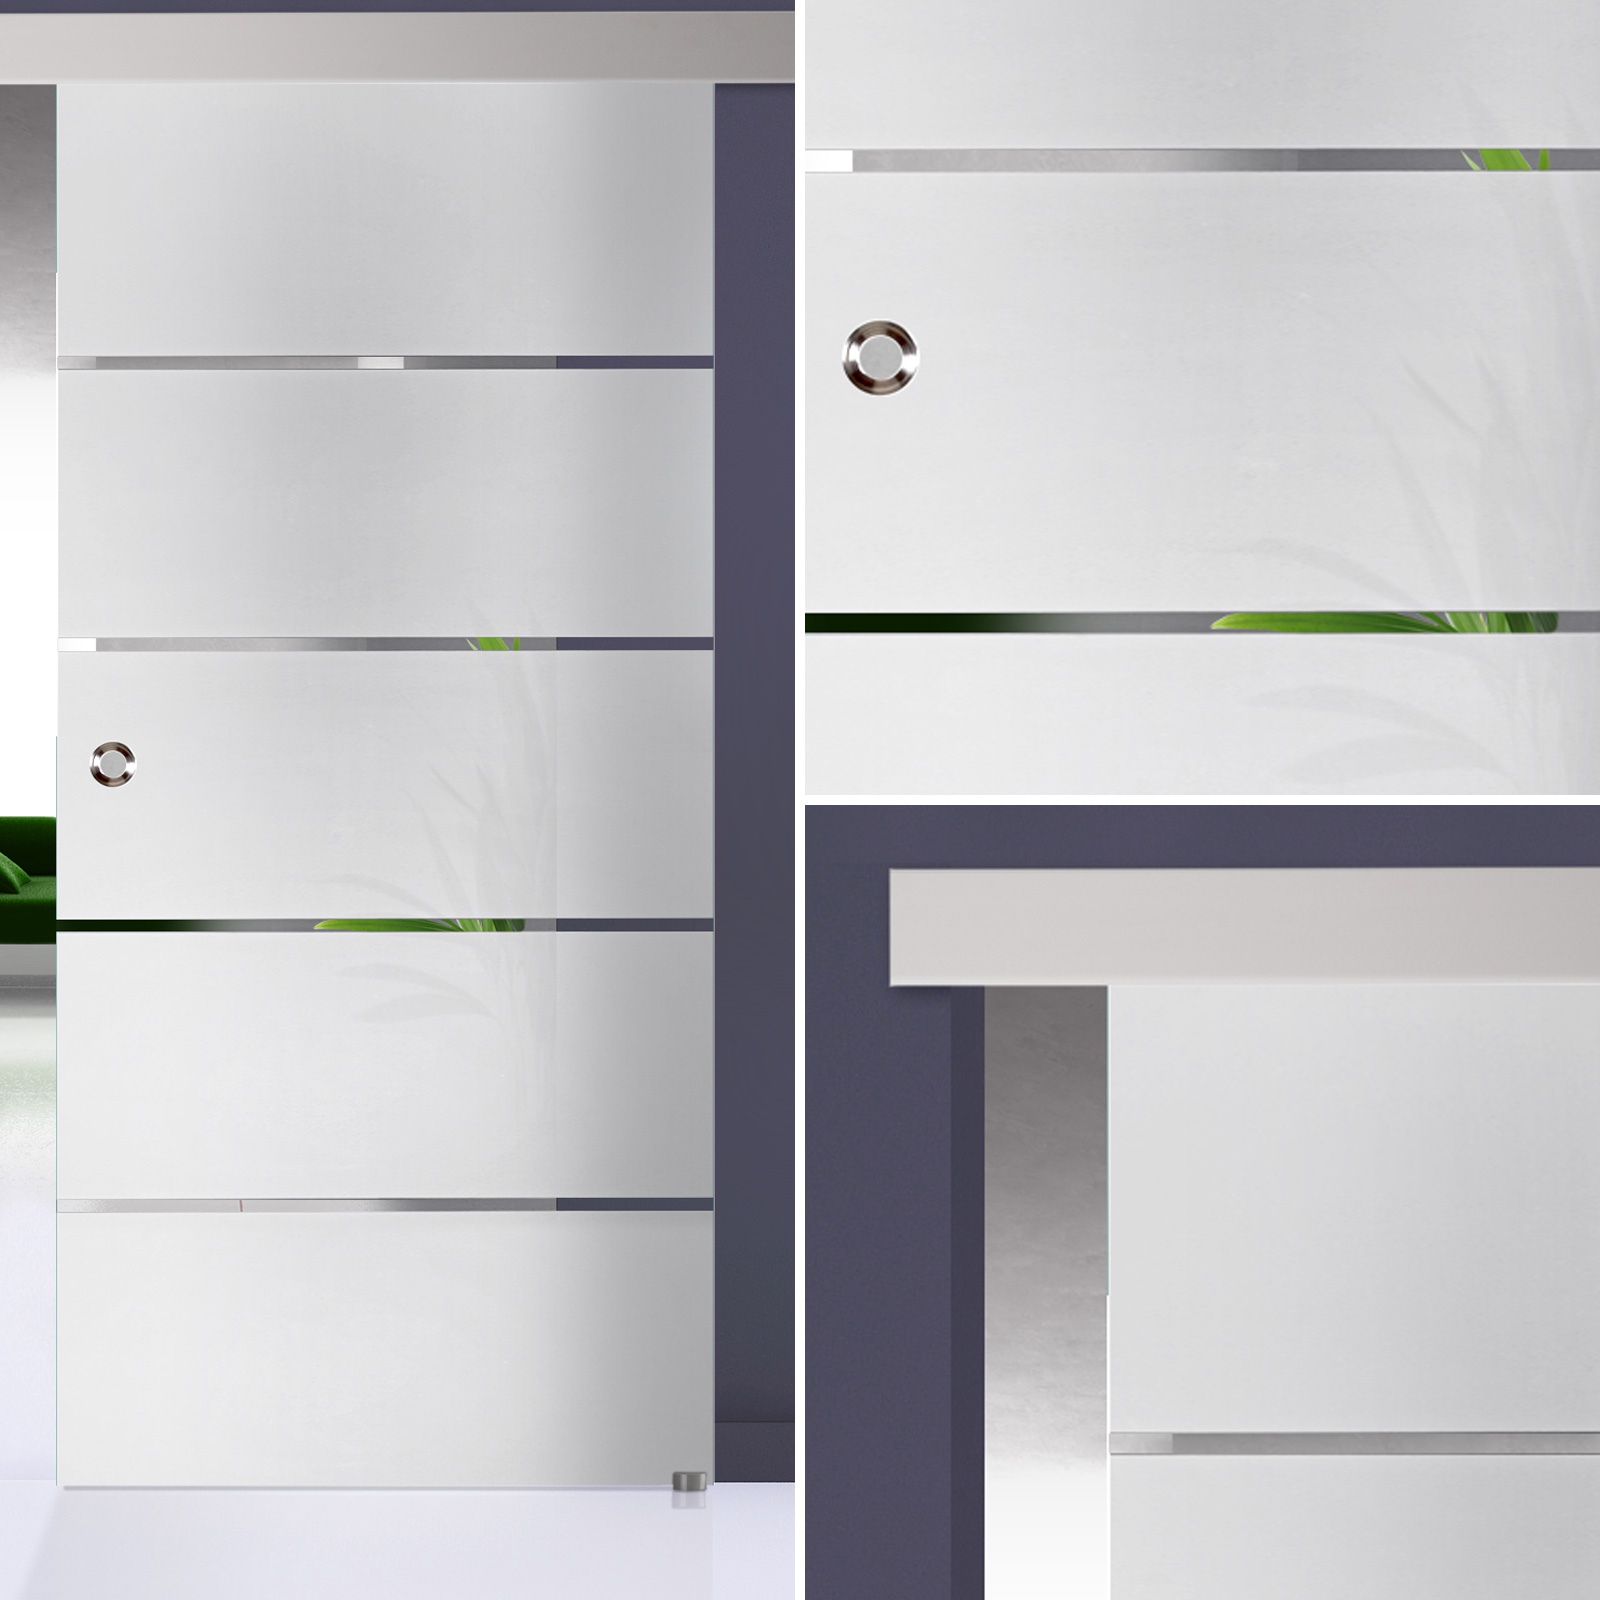 glasschiebet r 125 1 f alu60 streifen kueche. Black Bedroom Furniture Sets. Home Design Ideas